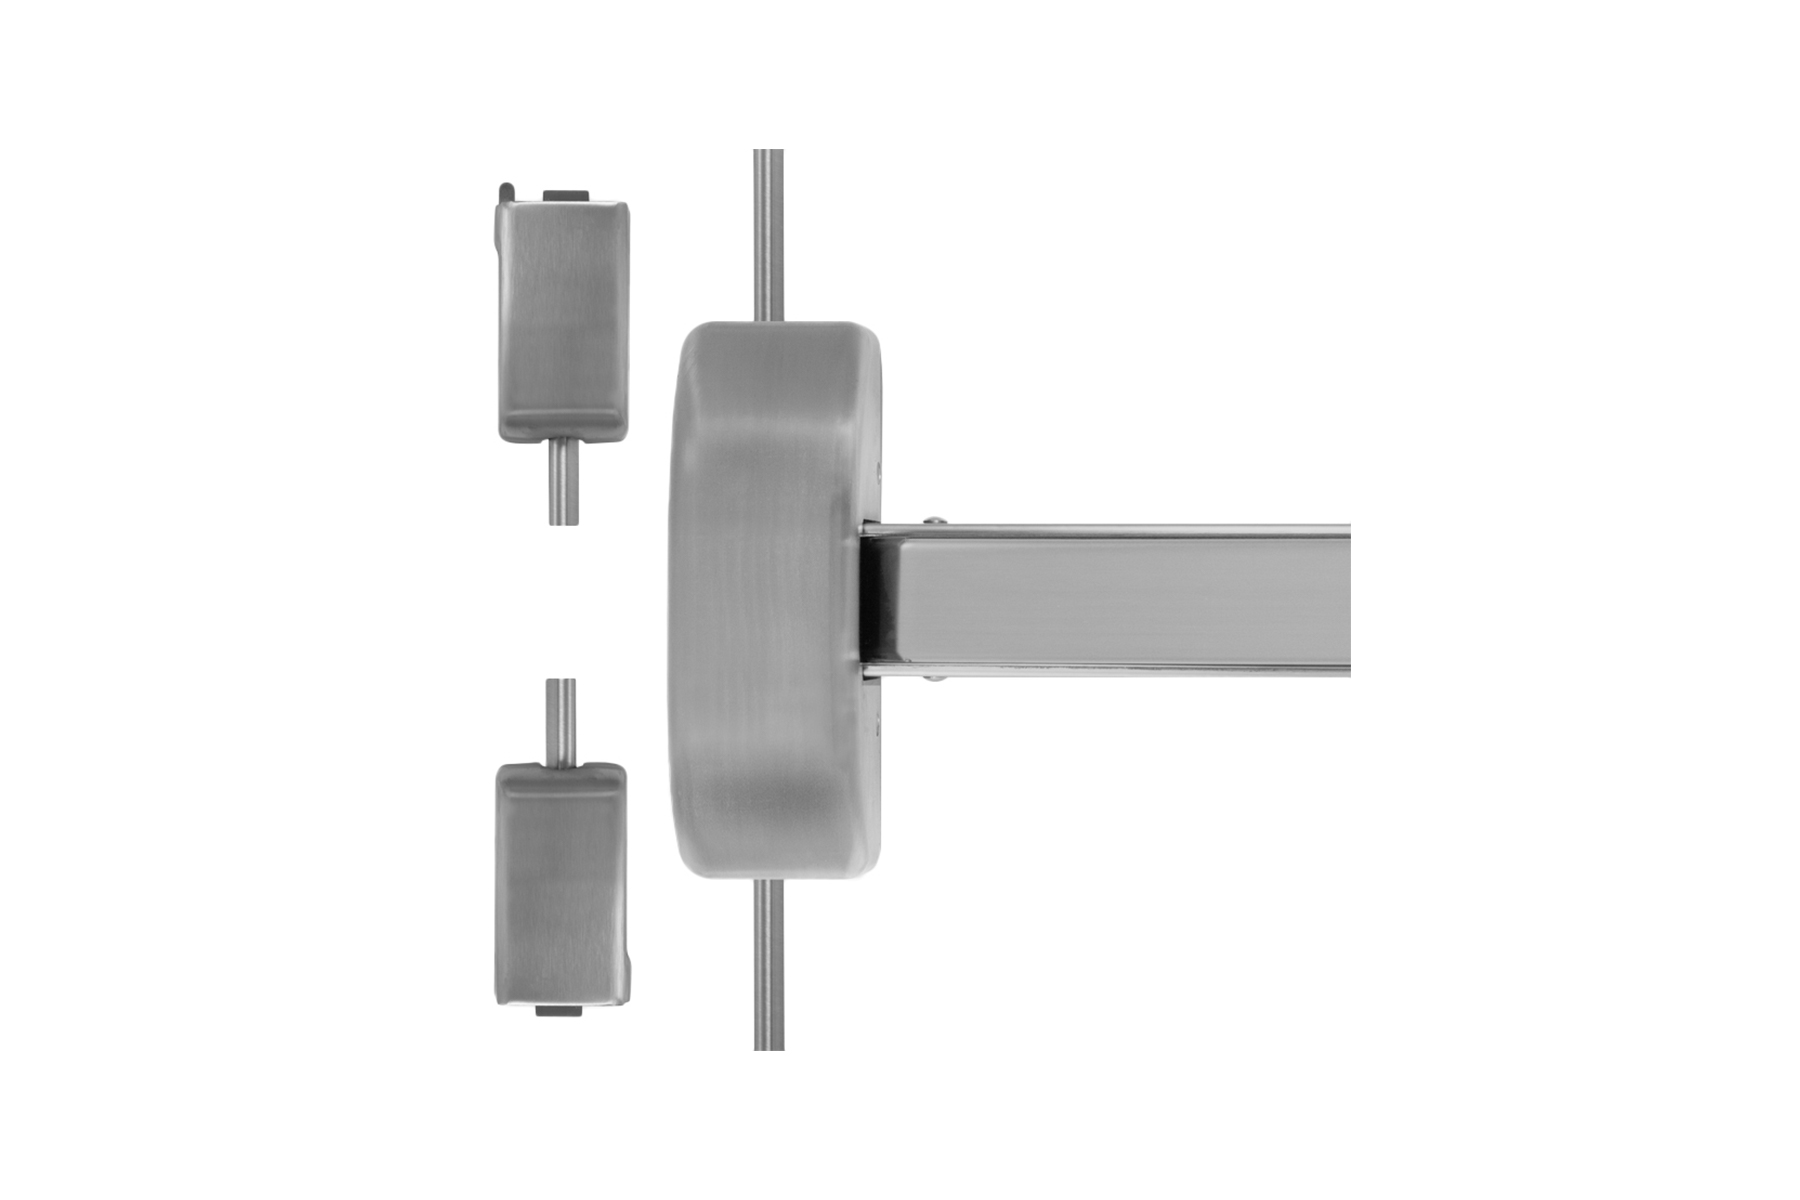 Dorex 9500 Series Exit Device Vertical Bar